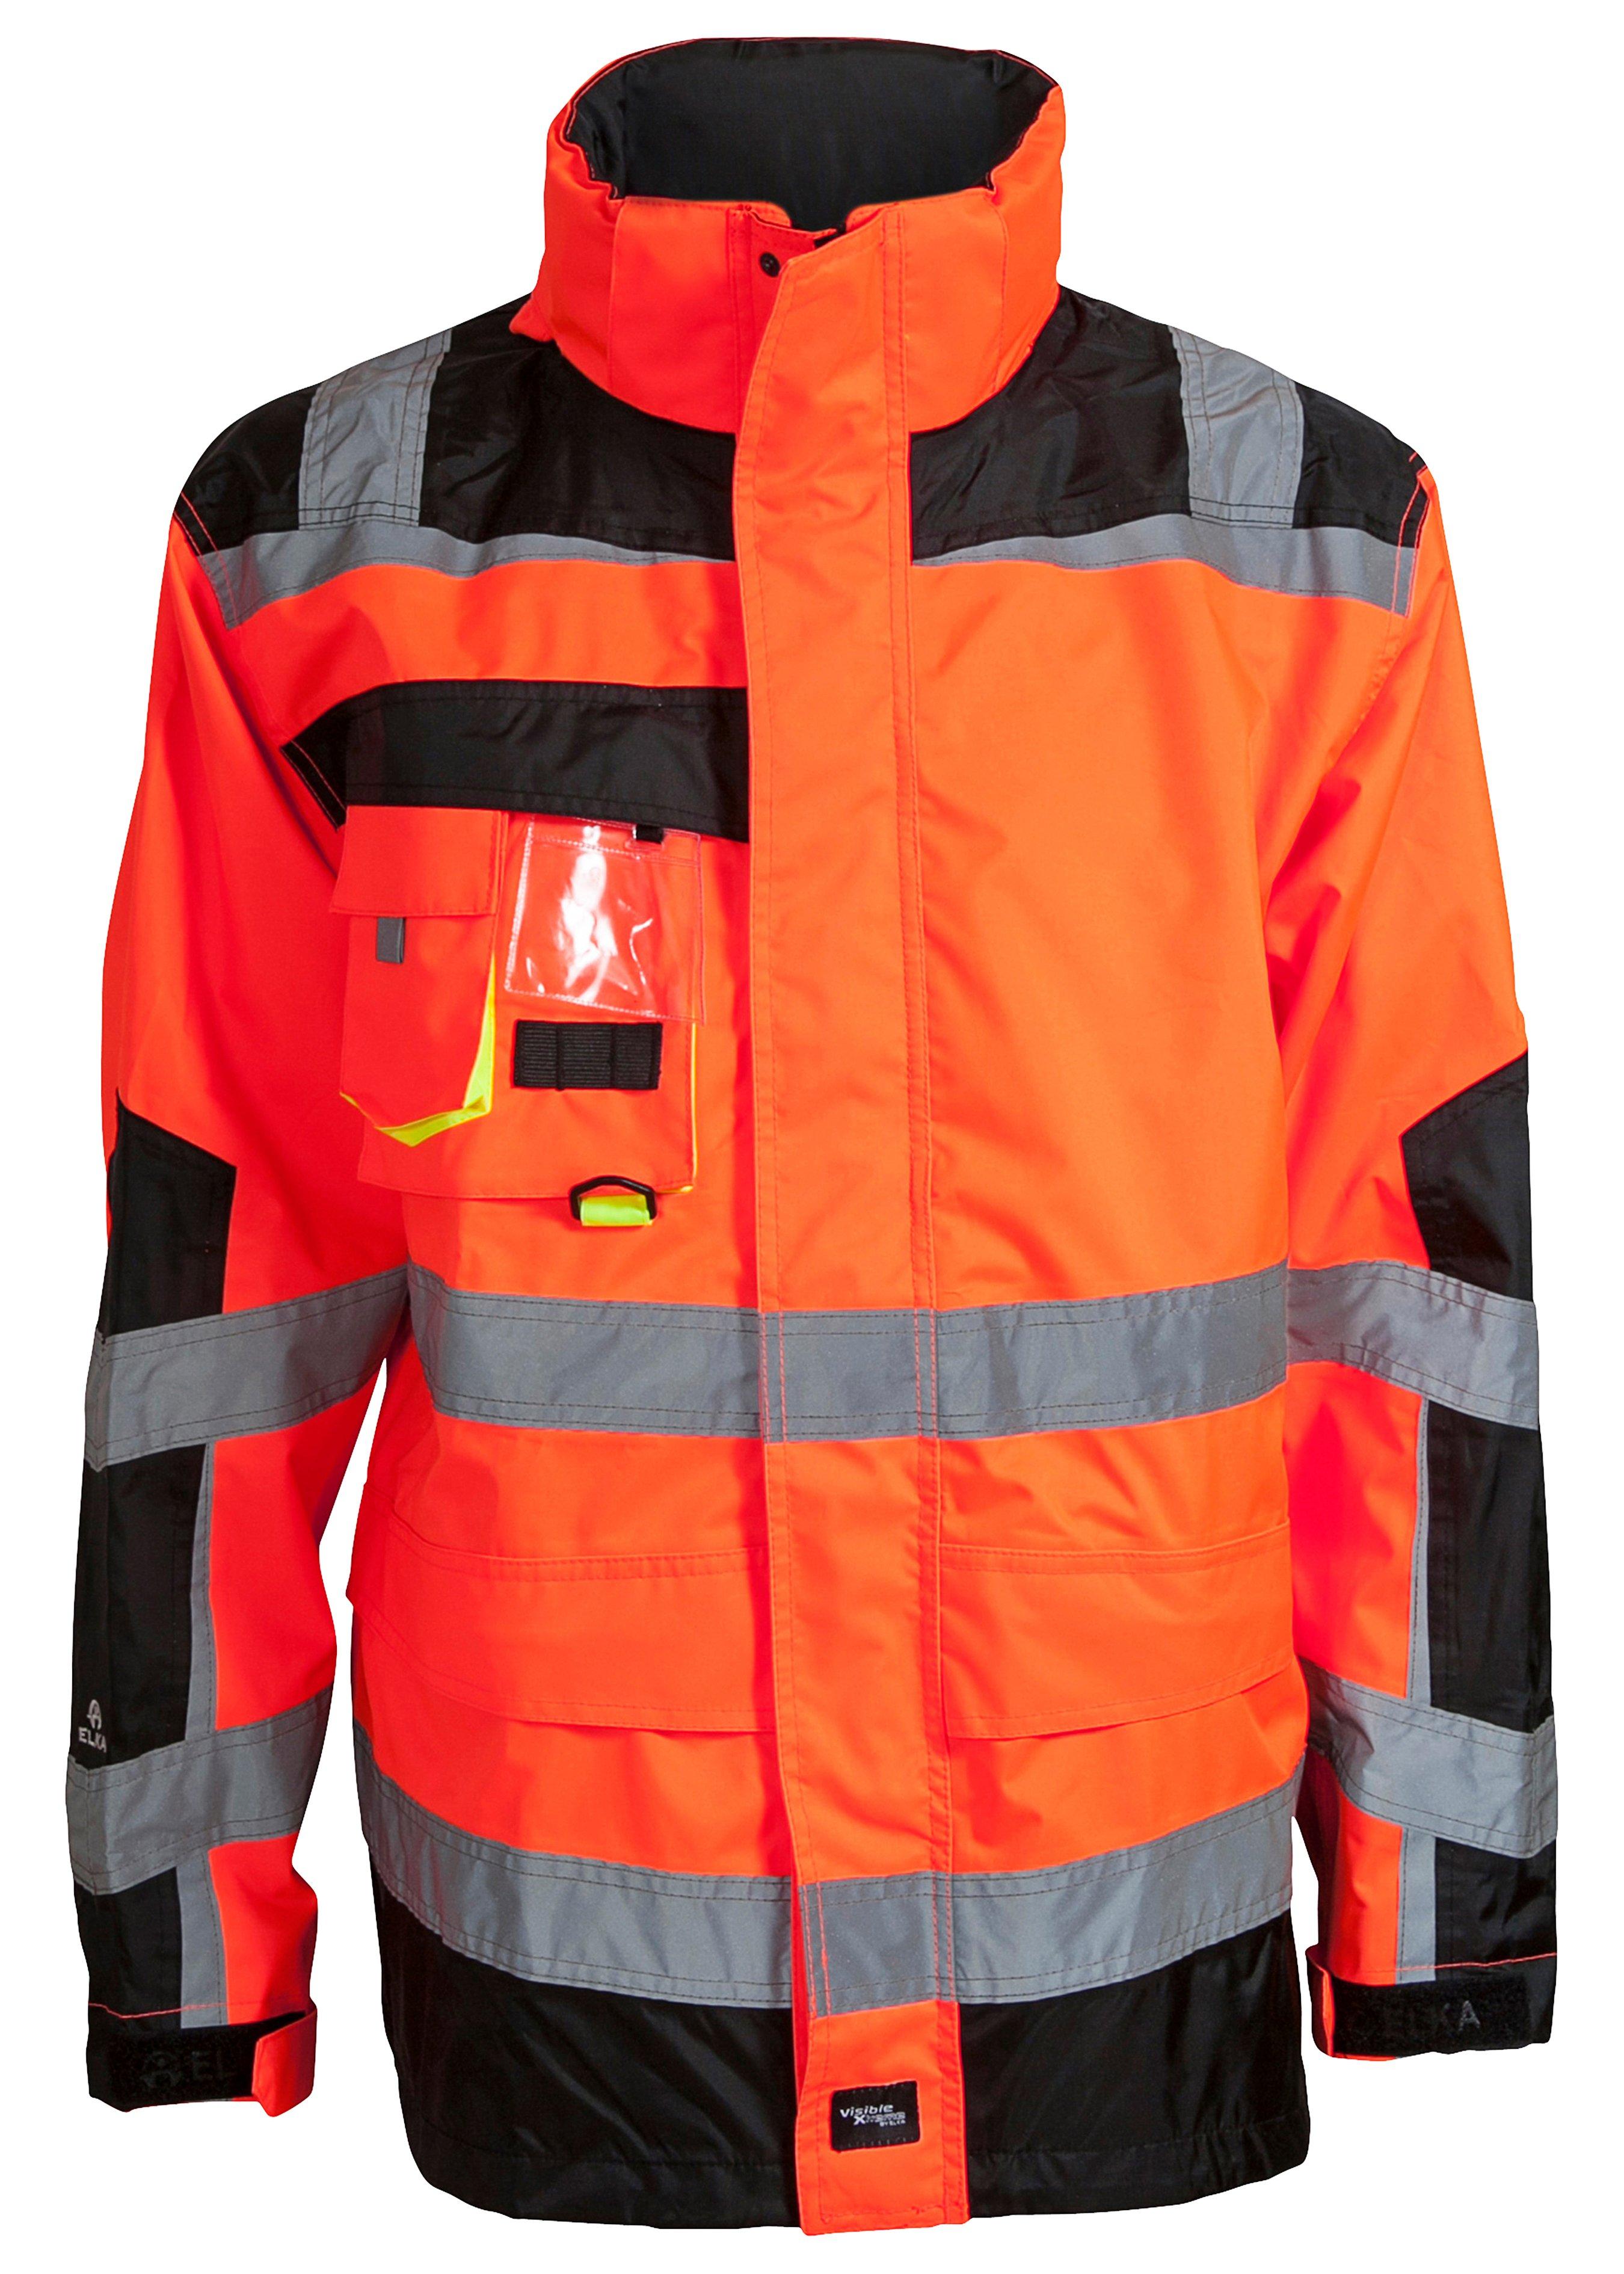 Elka Visible Xtreme Warnschutz Regenjacke 225154L 1